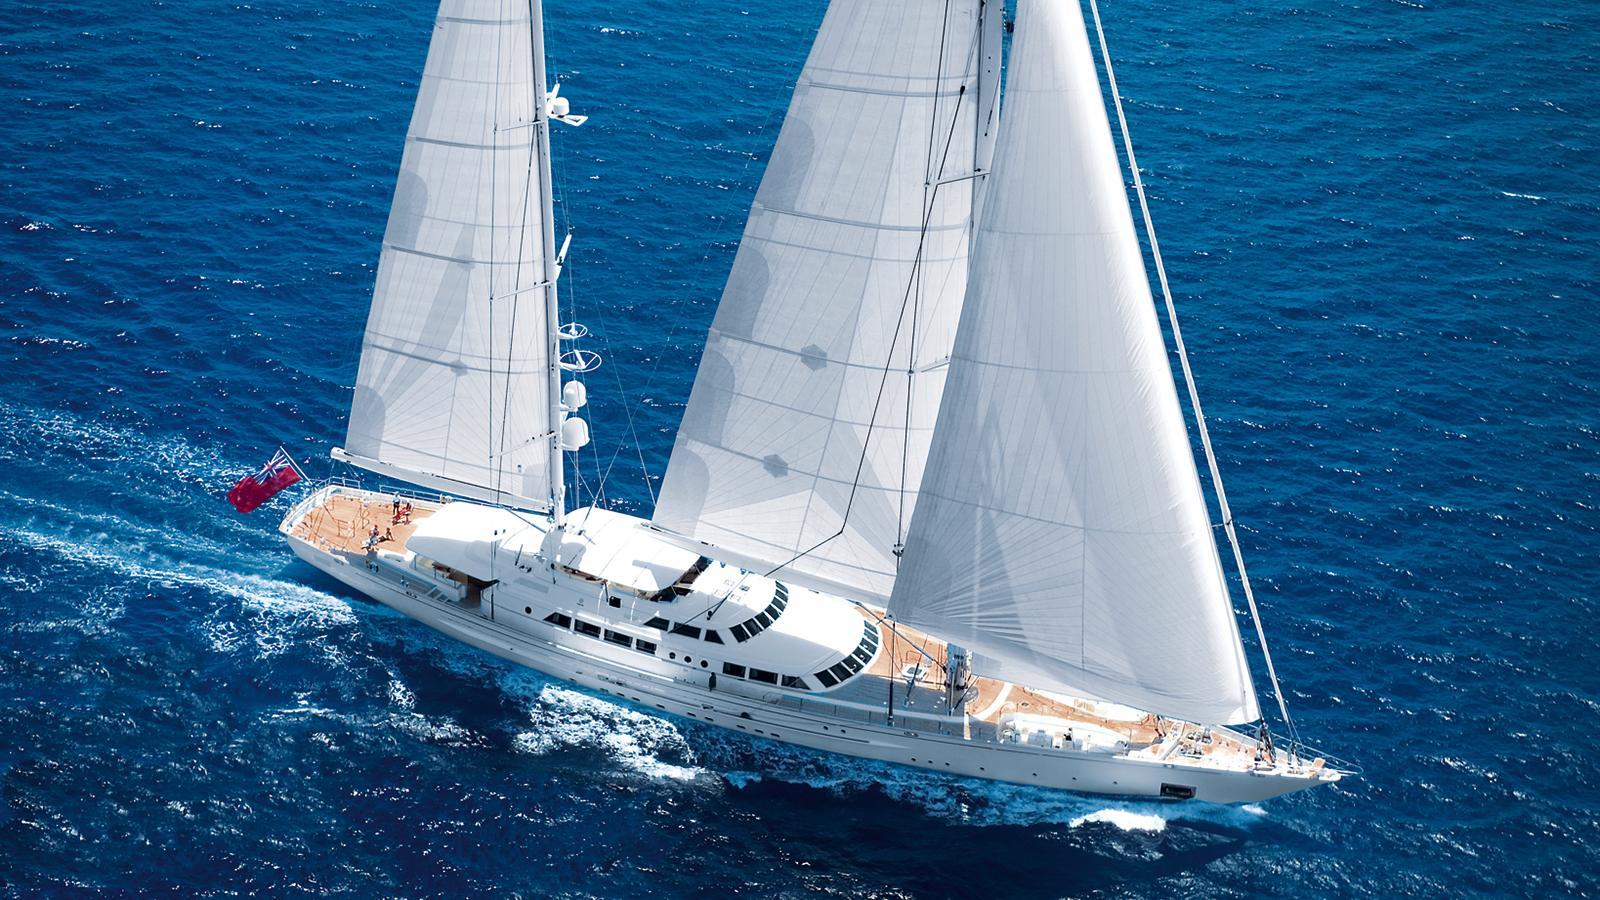 spirit-of-the-cs-super-yacht-sailing-boat